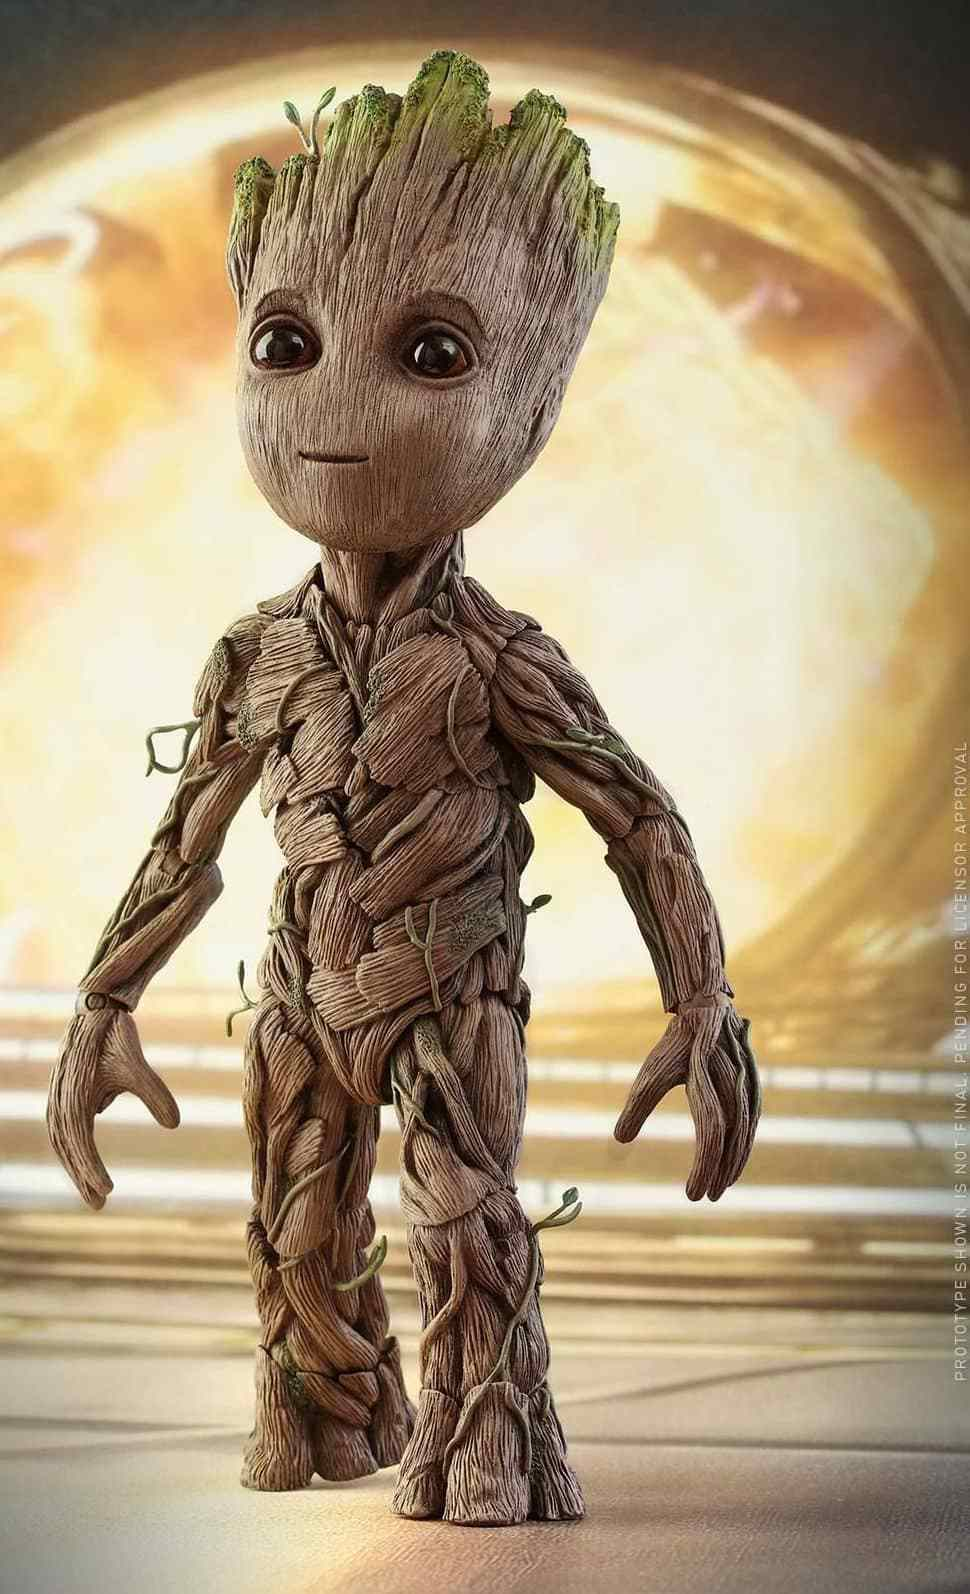 Baby Groot Cute Hd Wallpaper Ilmu Pengetahuan 7